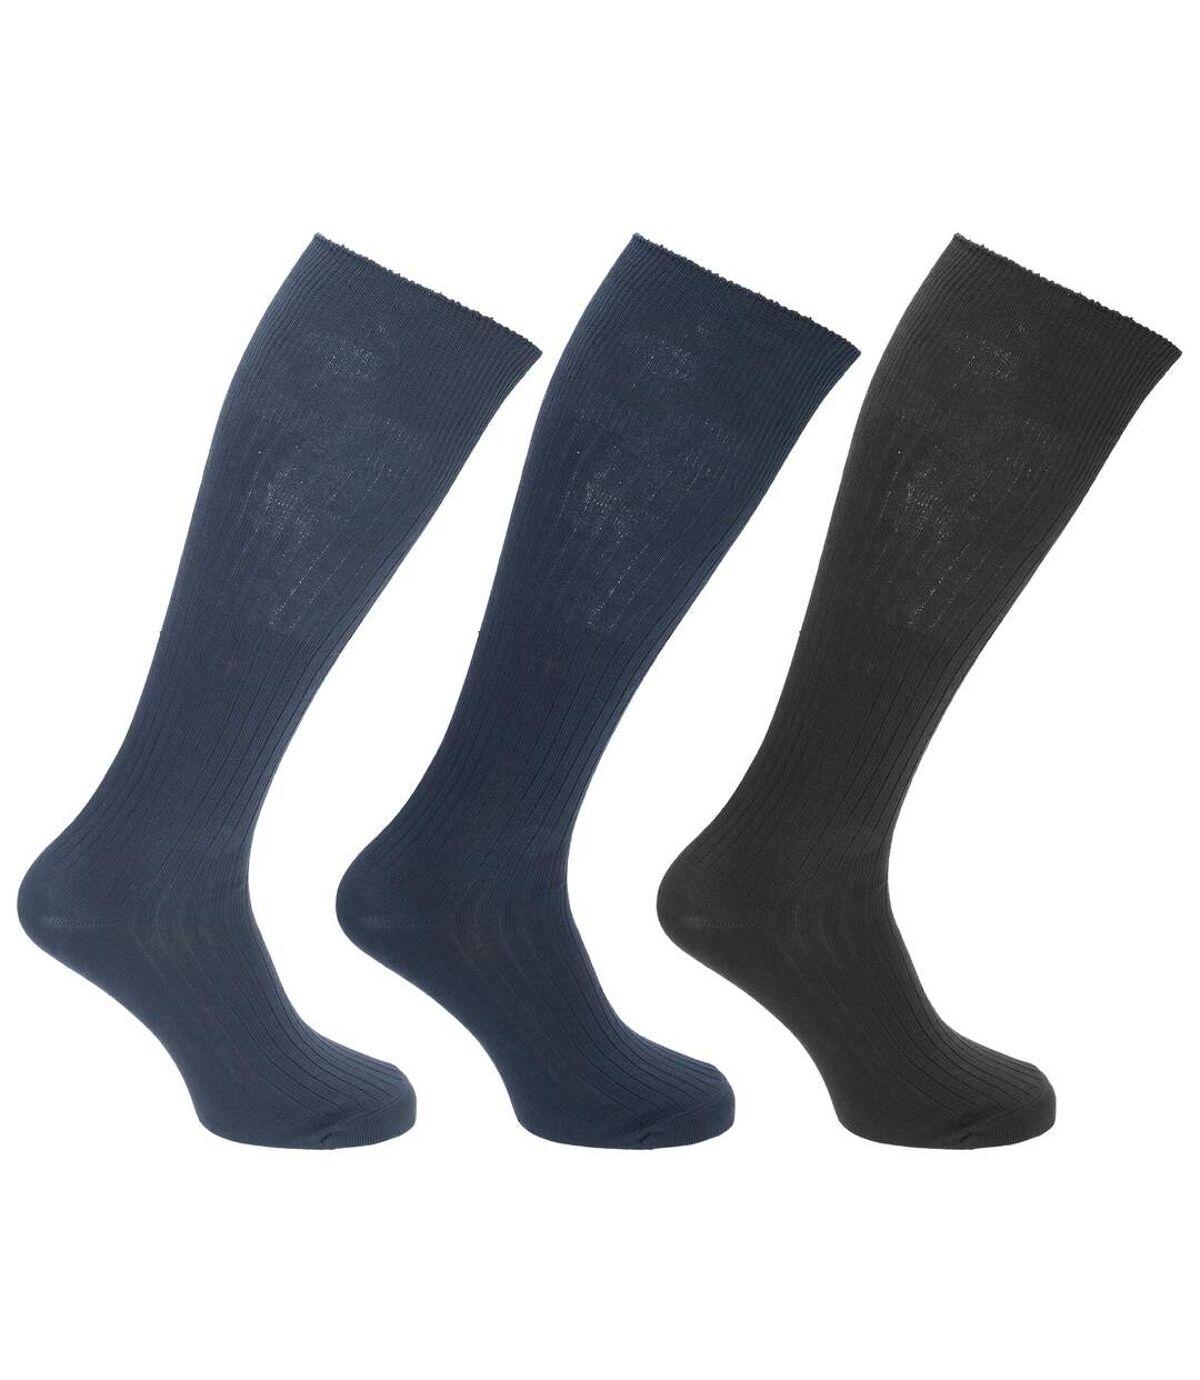 Mens 100% Cotton Ribbed Knee High Socks (Pack Of 3) (Blue/Black/Navy) - UTMB489